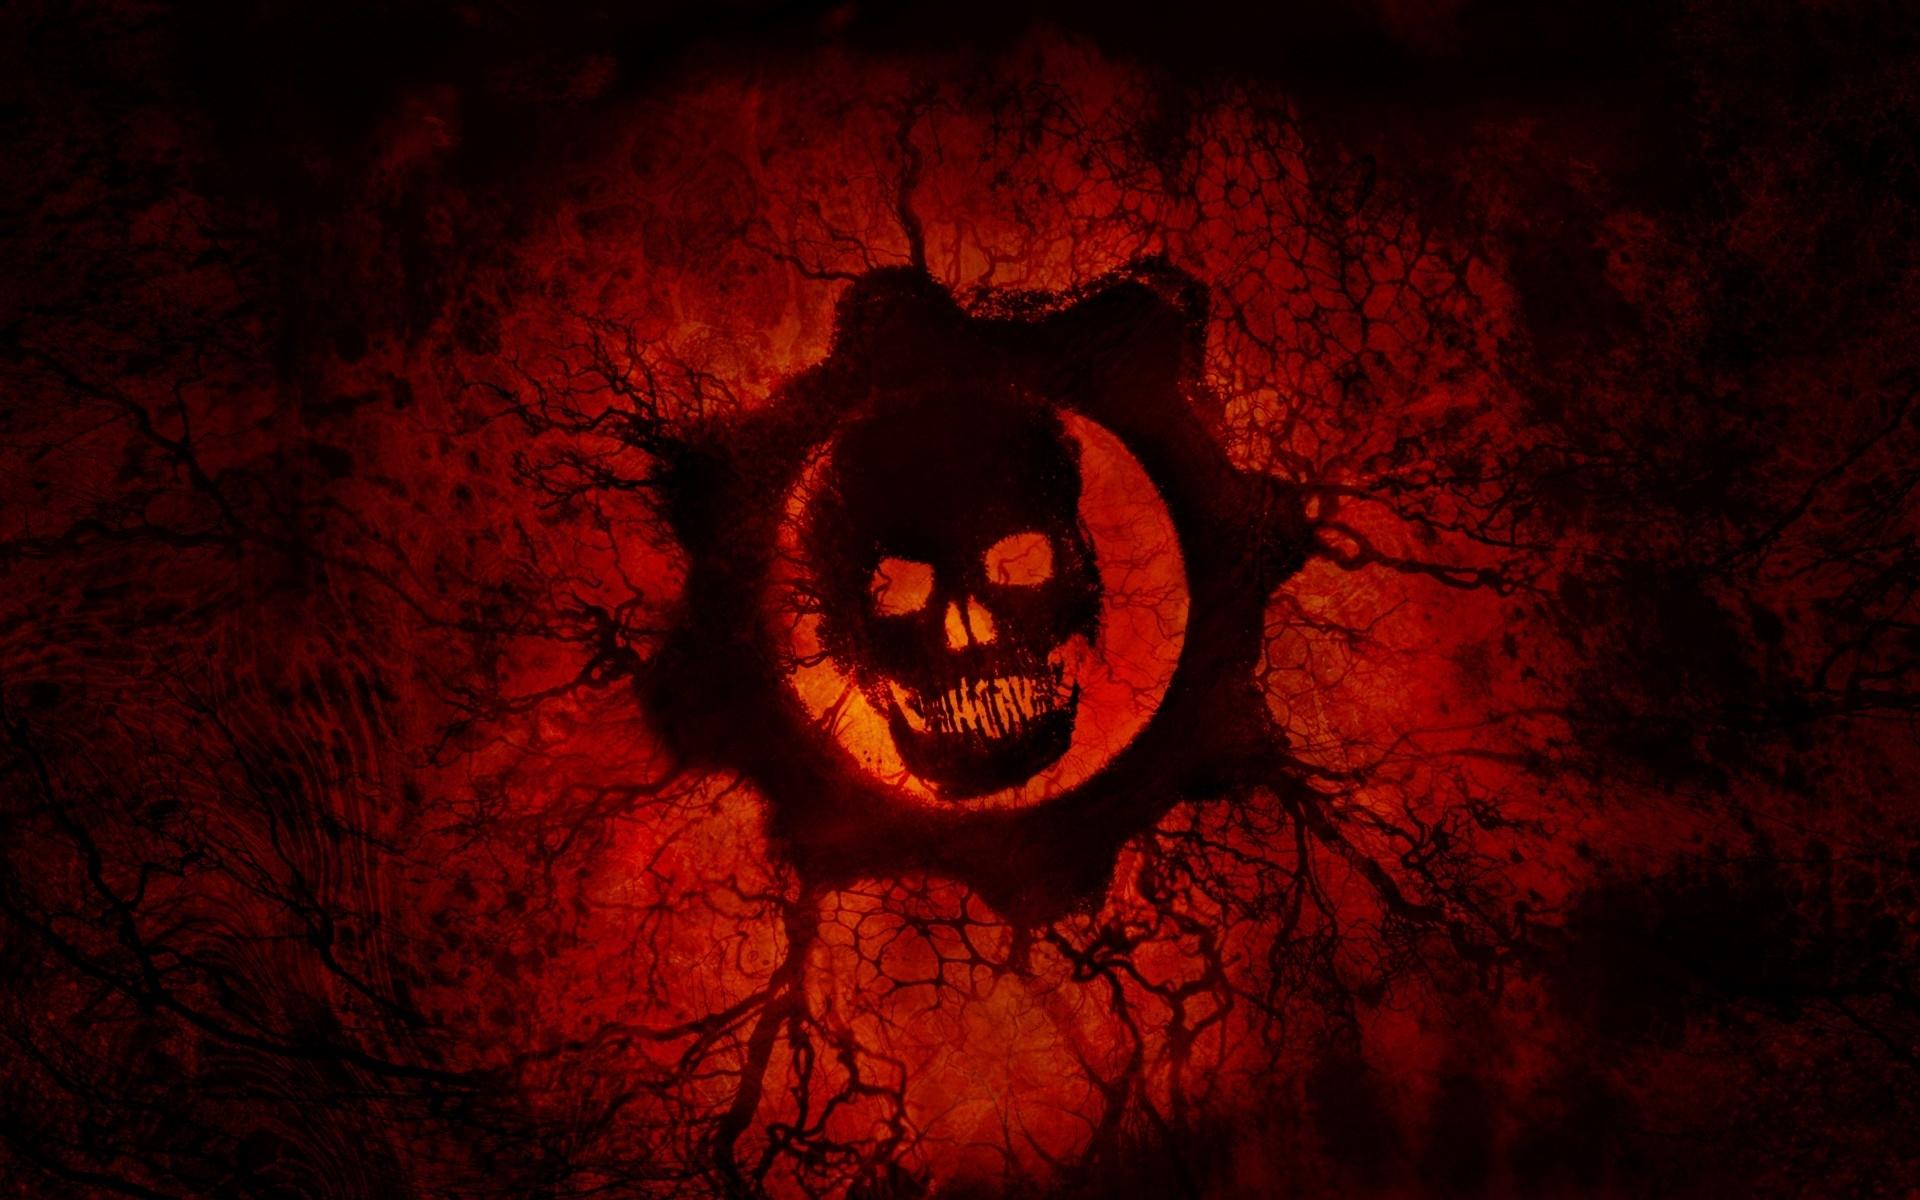 wallpaper crimson omen, red skull, gears of war, hd, 4k, 8k, games